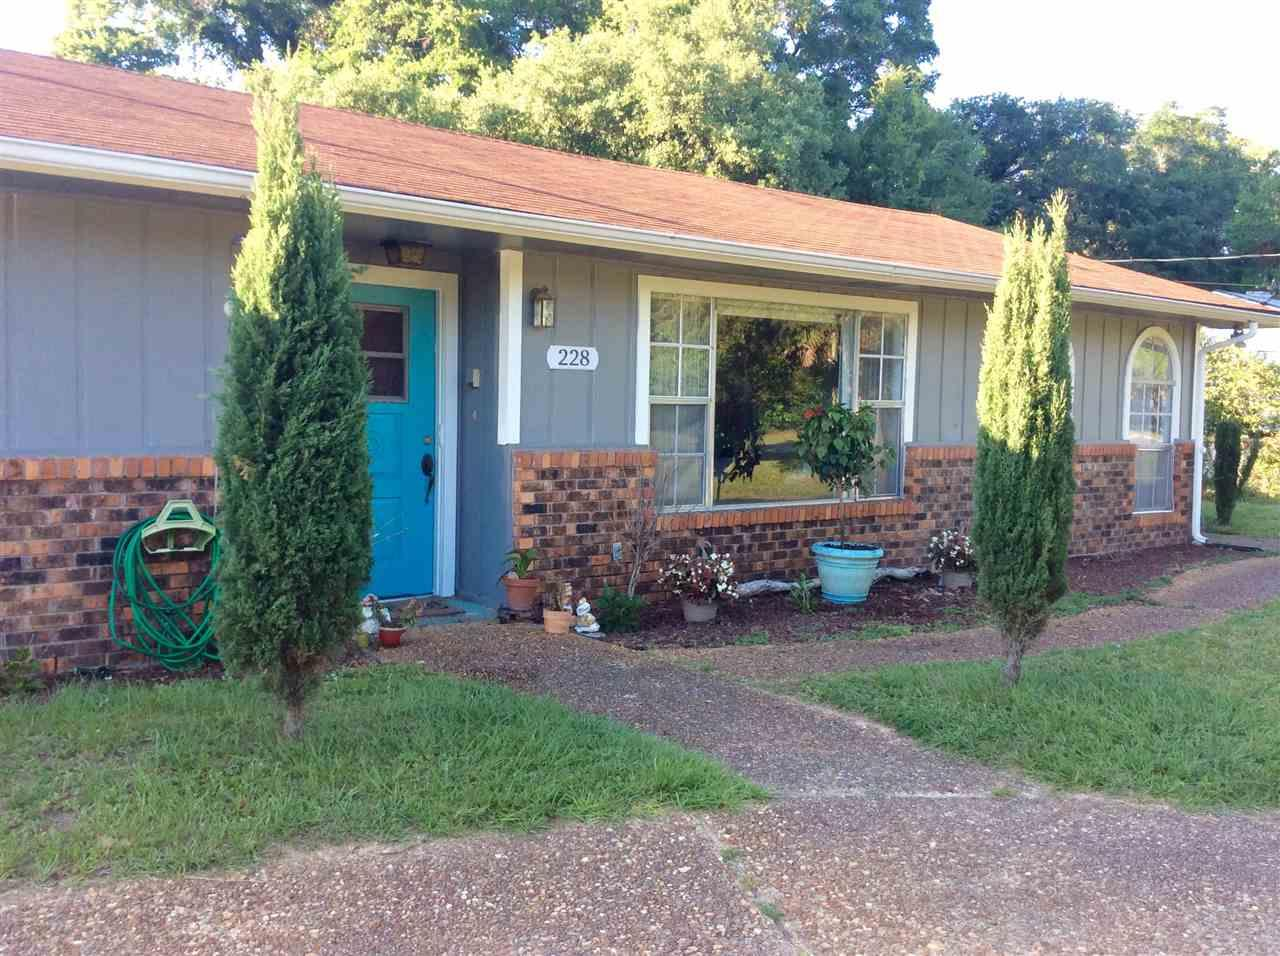 228 BETTY RD, PENSACOLA, FL 32507